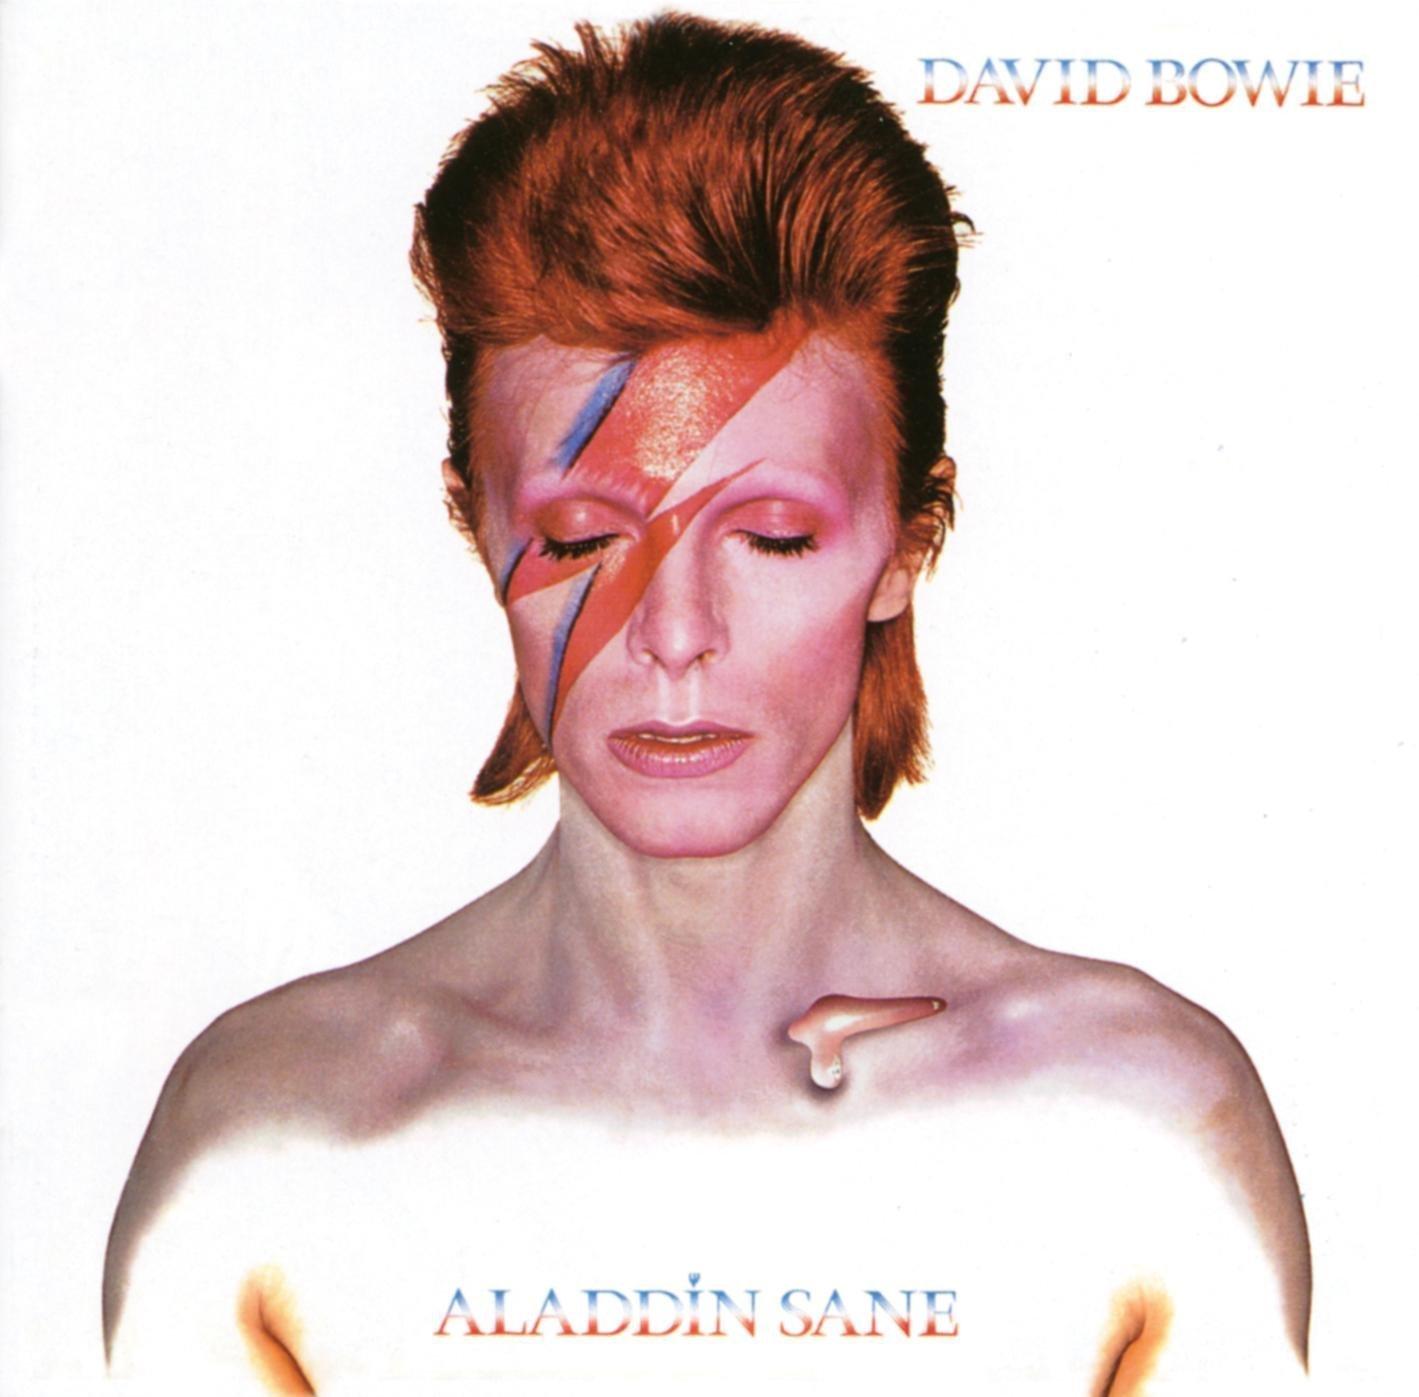 David Bowie - Aladdin Sane [LP]